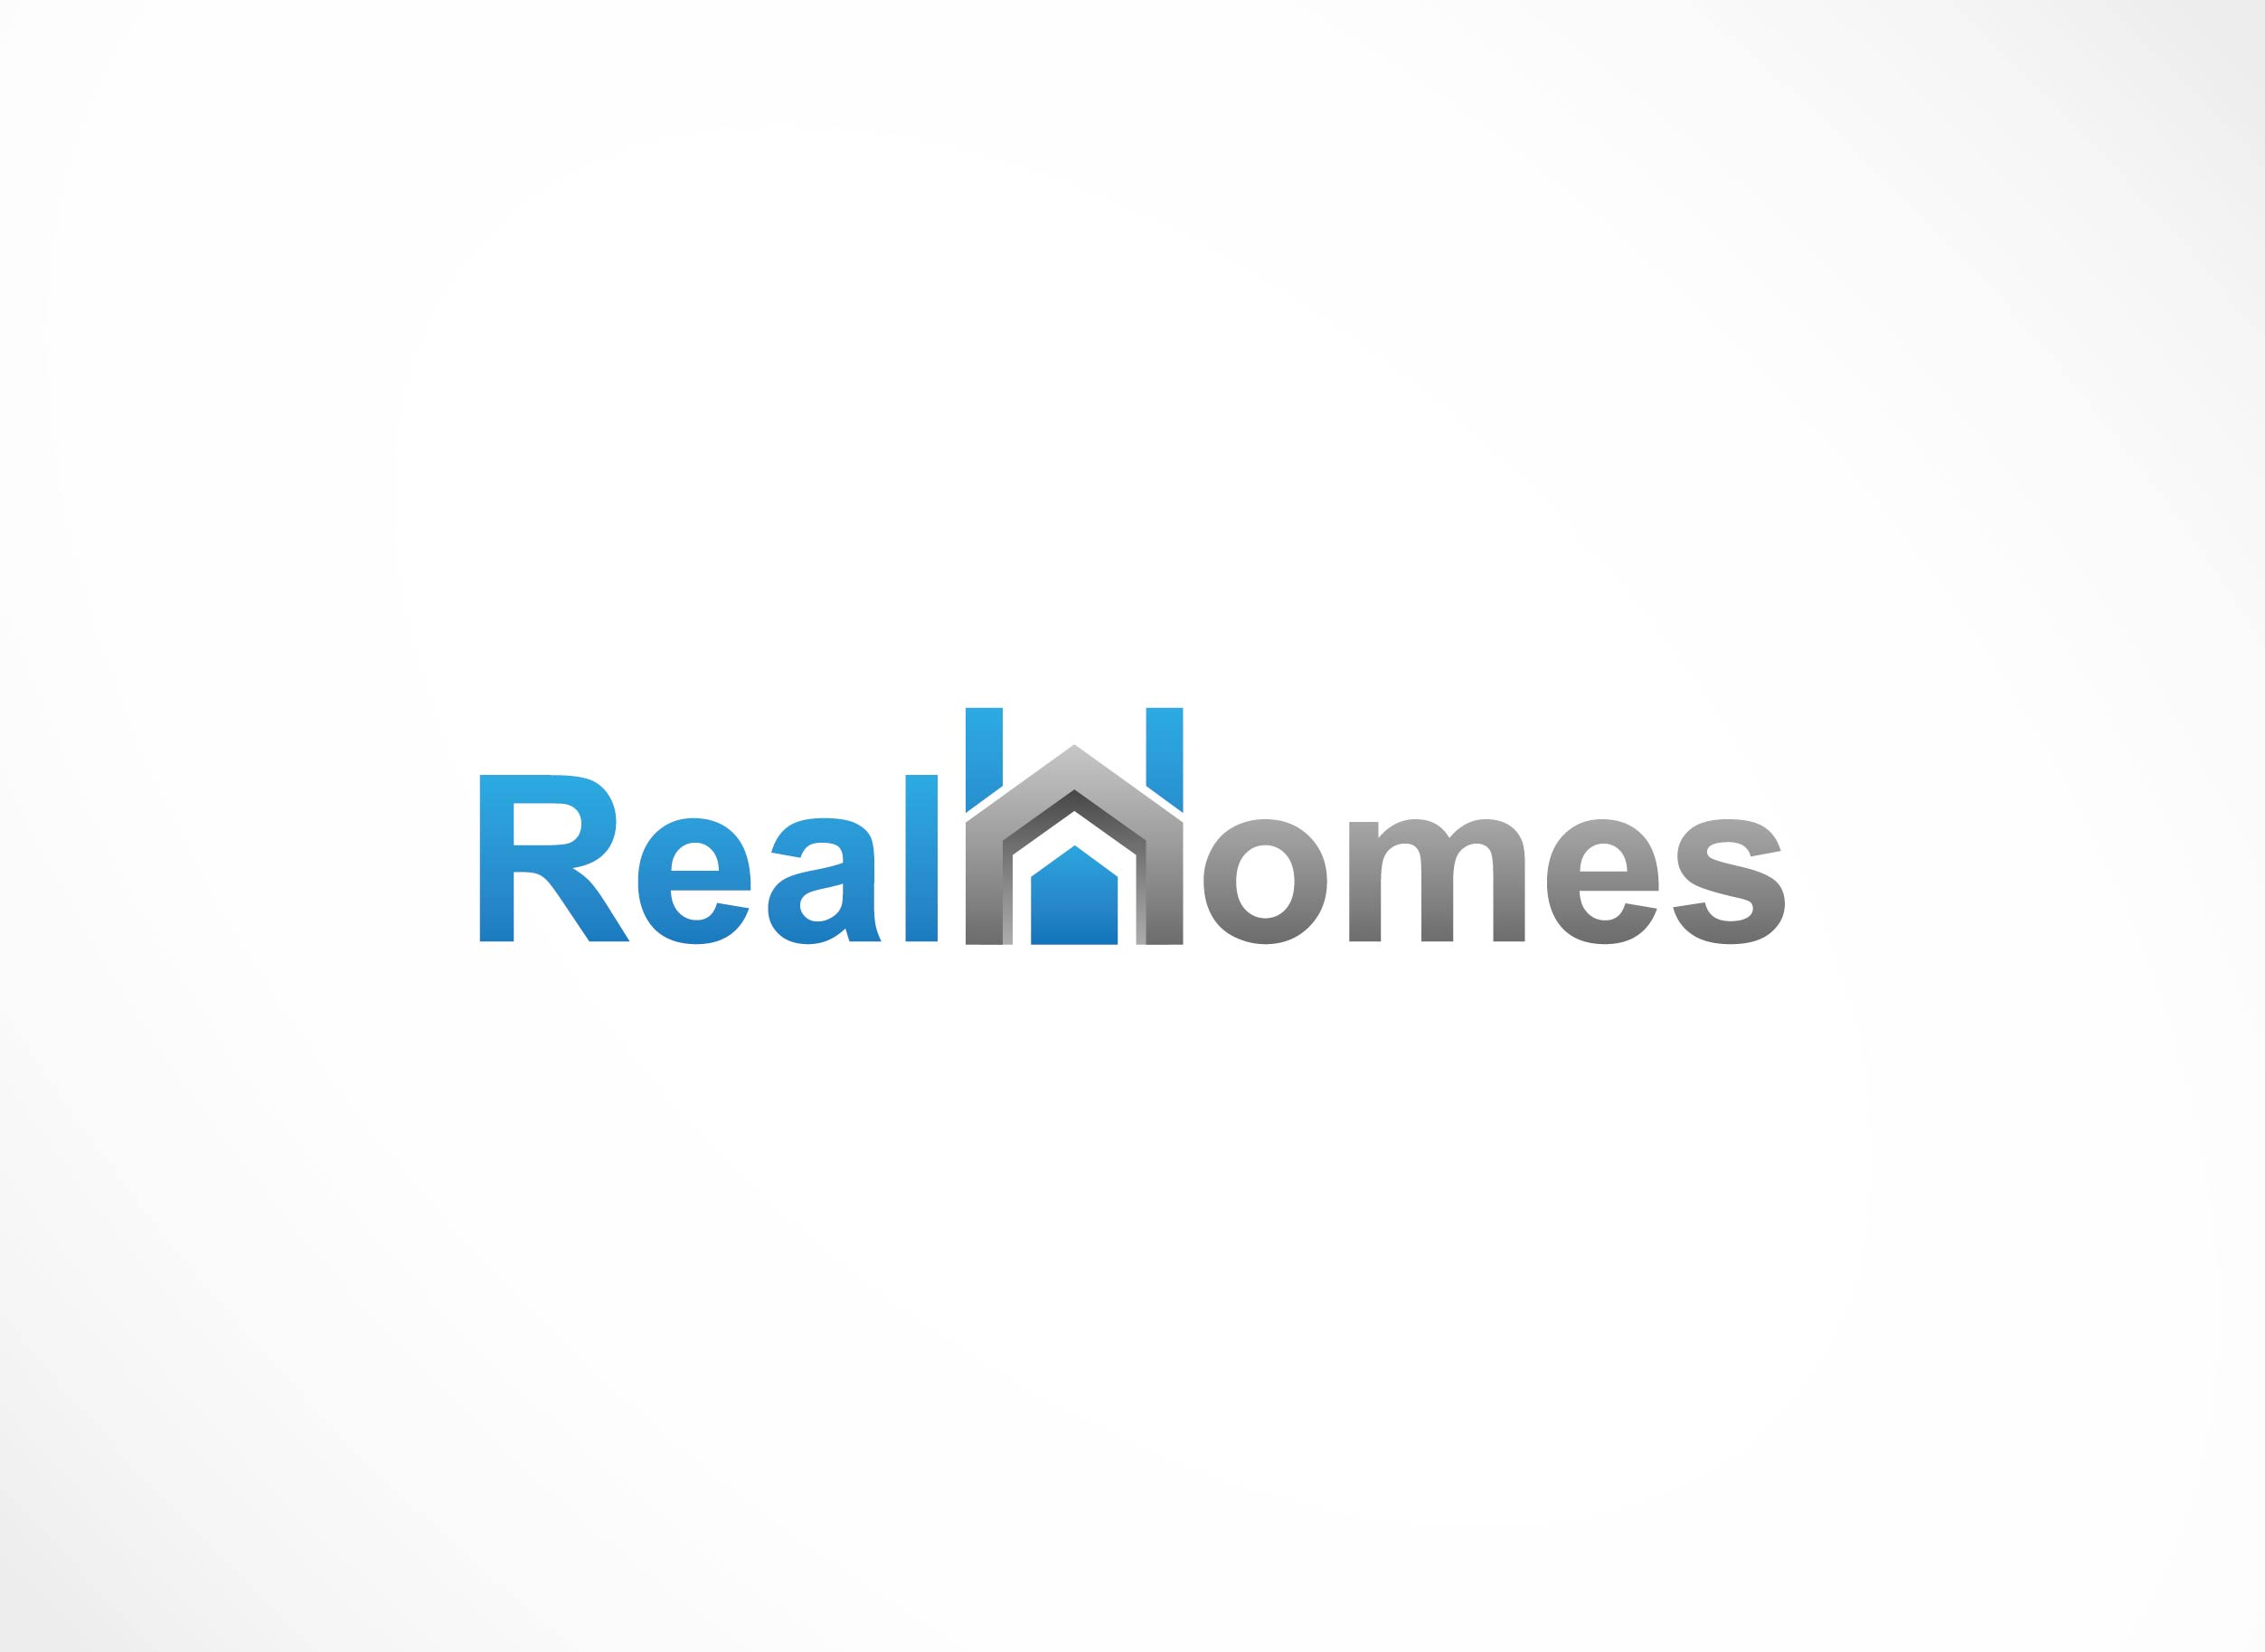 Logo Design by Adnan Taqi - Entry No. 20 in the Logo Design Contest Captivating Logo Design for Real Homes.